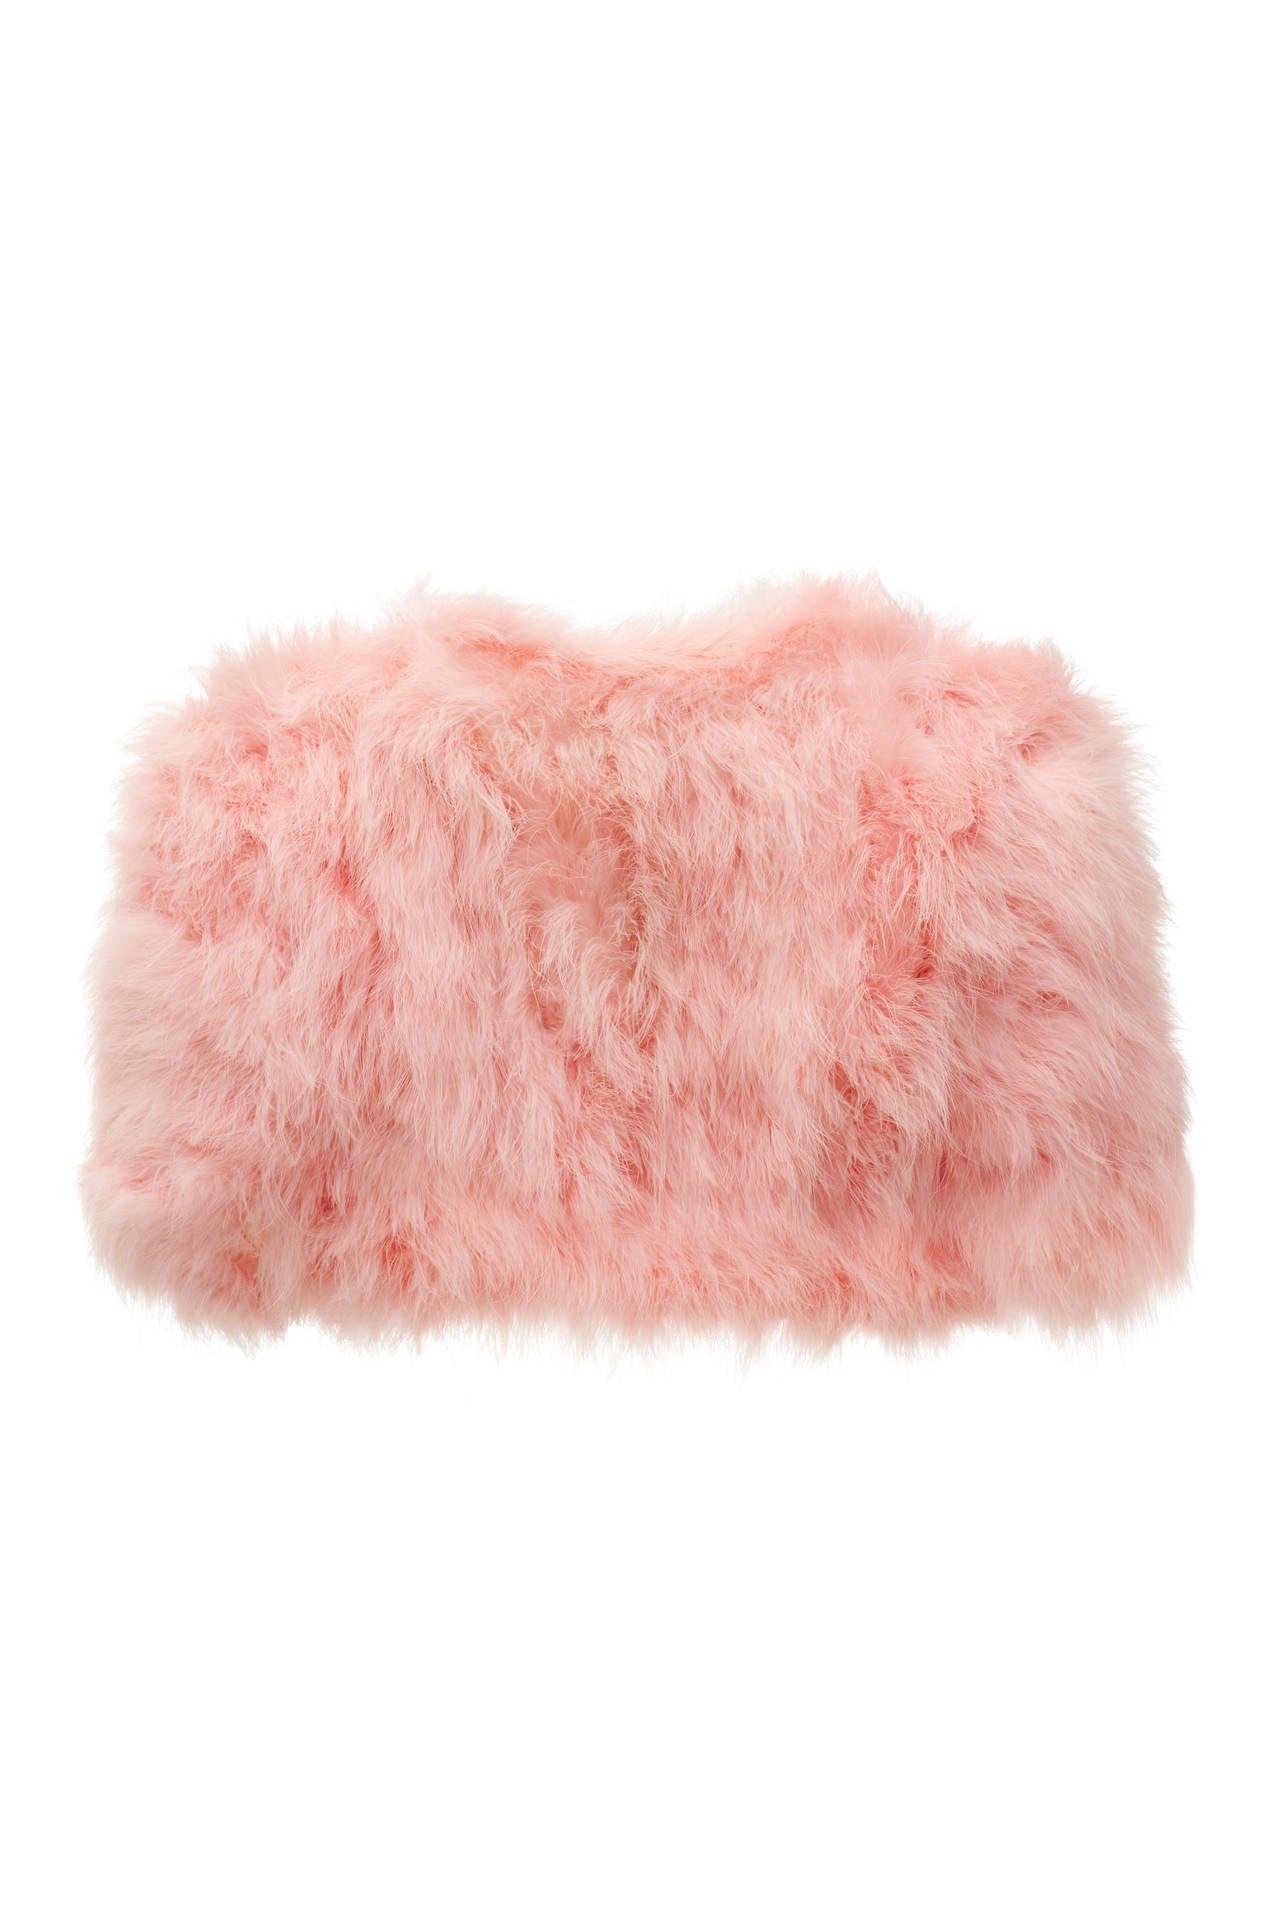 1950s Pink Maribou feather Bolero 2